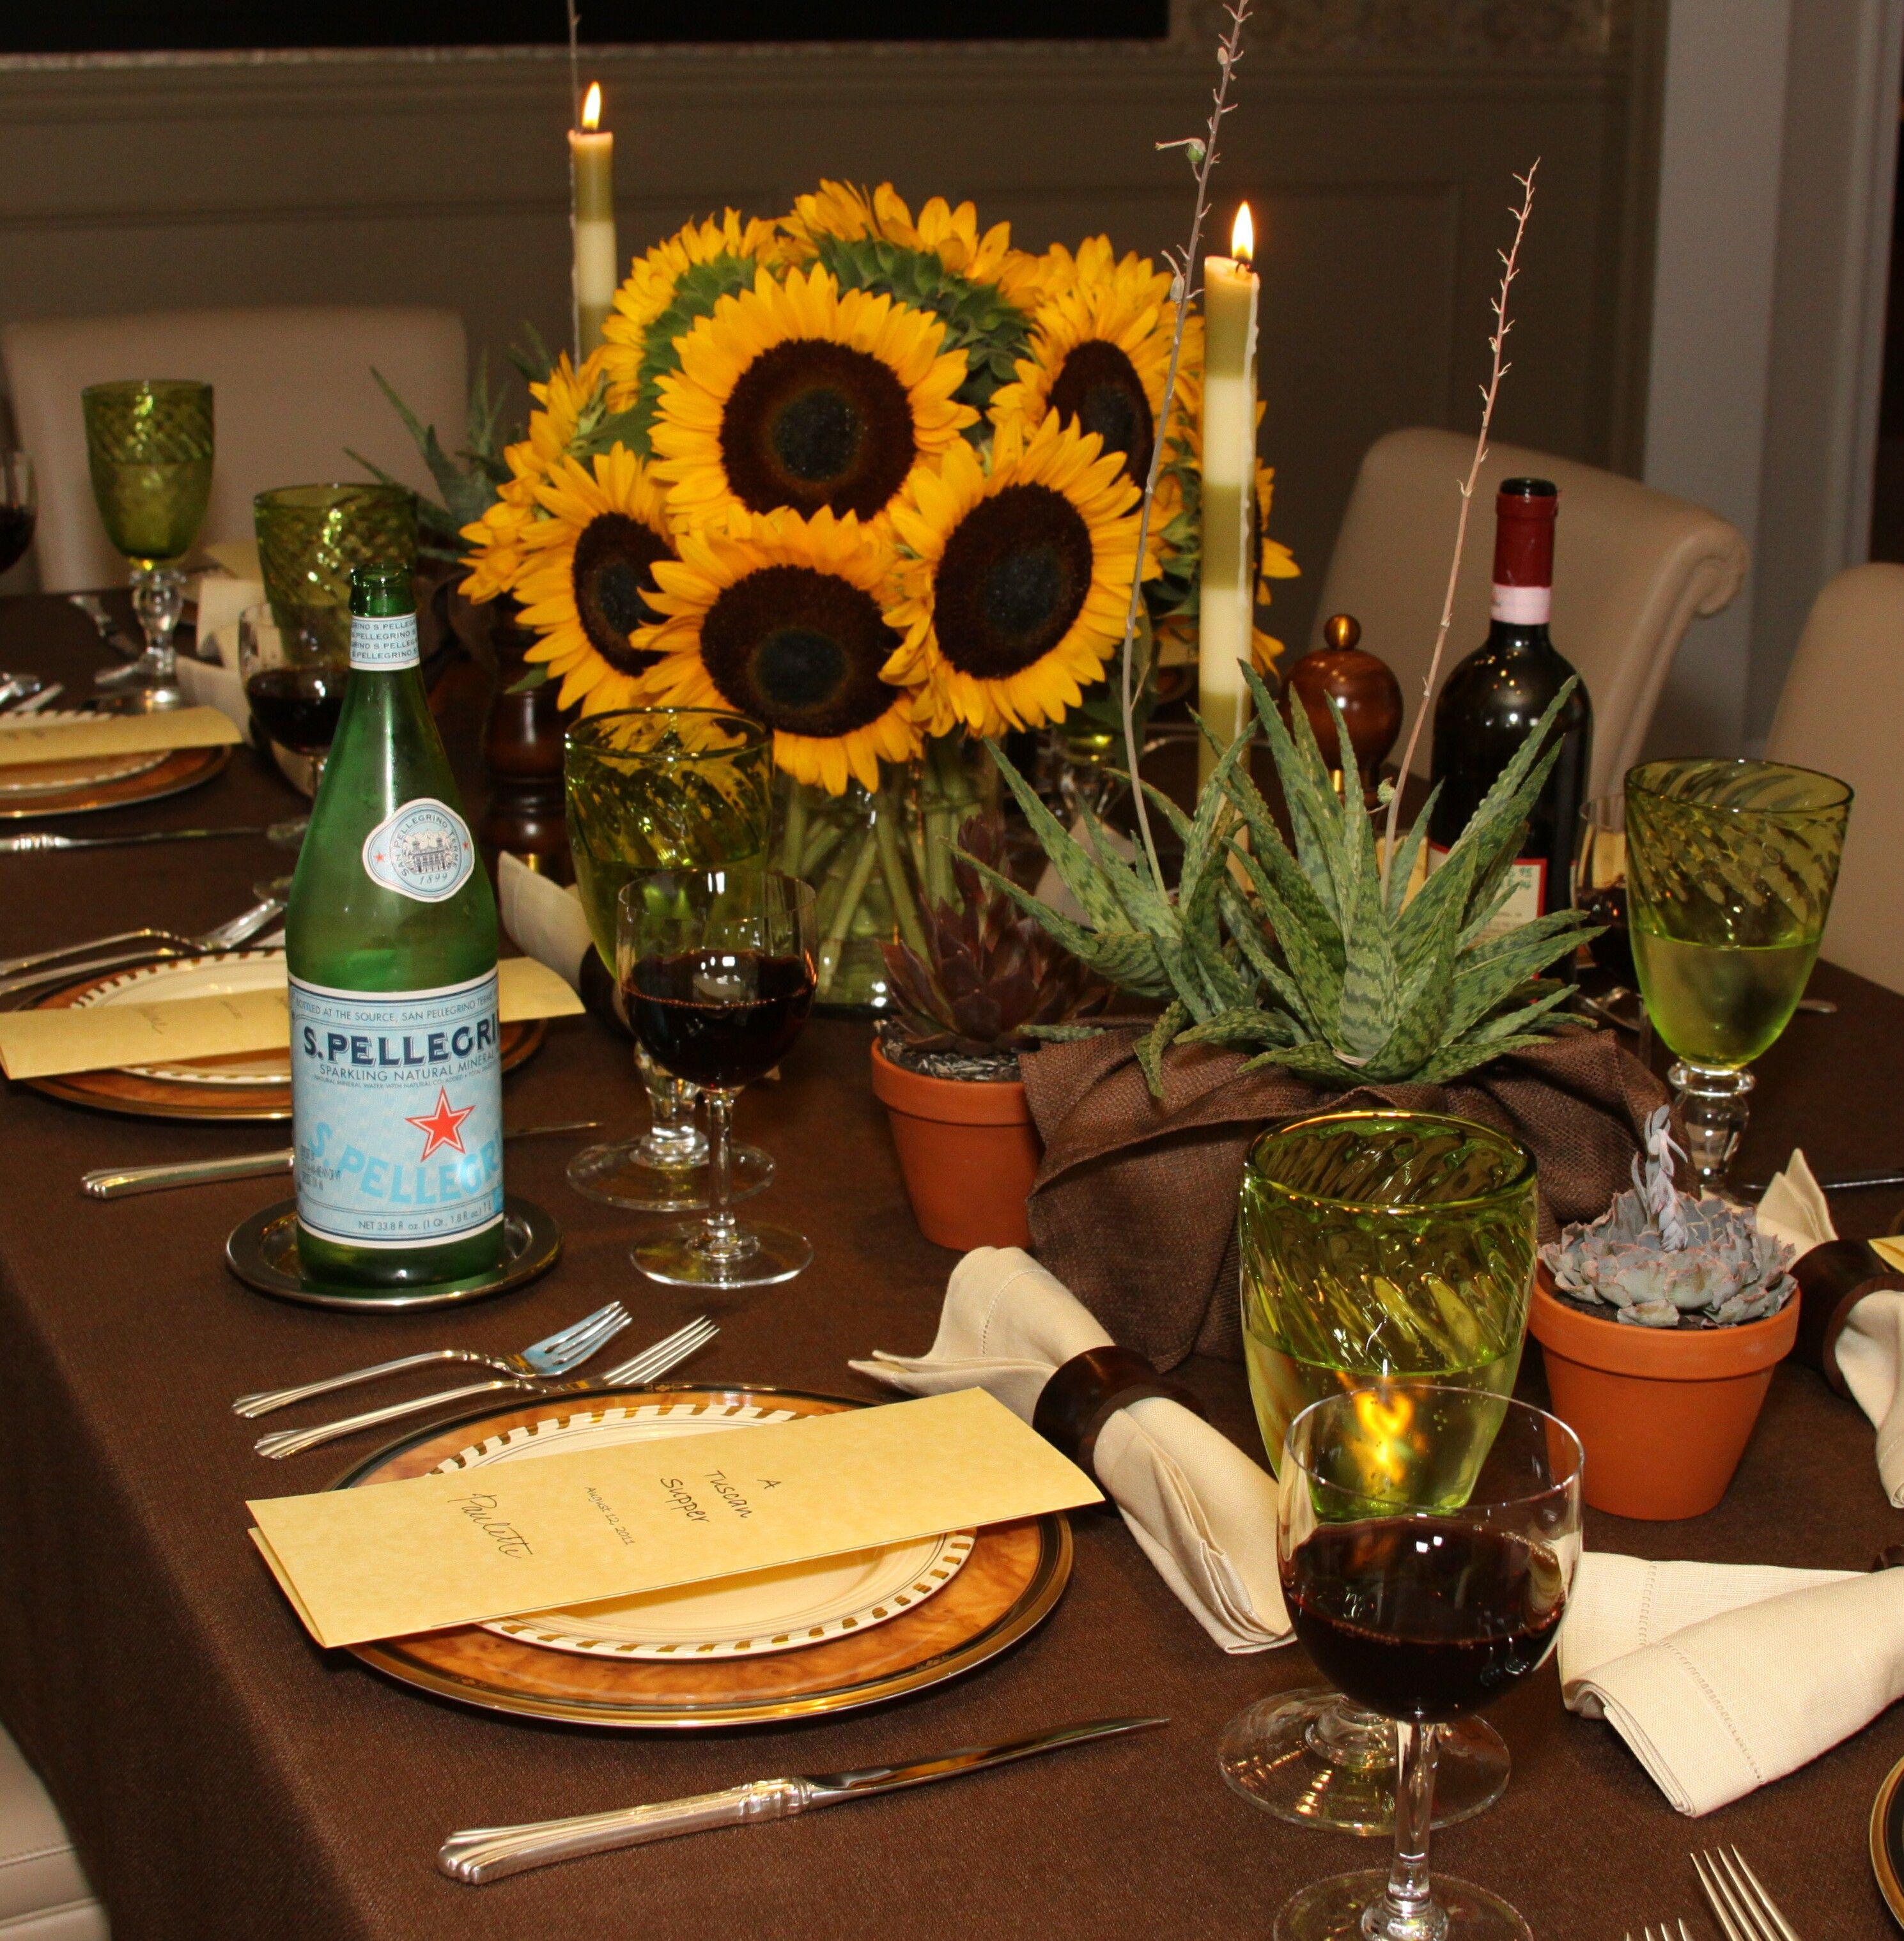 Italian Feast Tablescape Italian Dinner Party Decorations